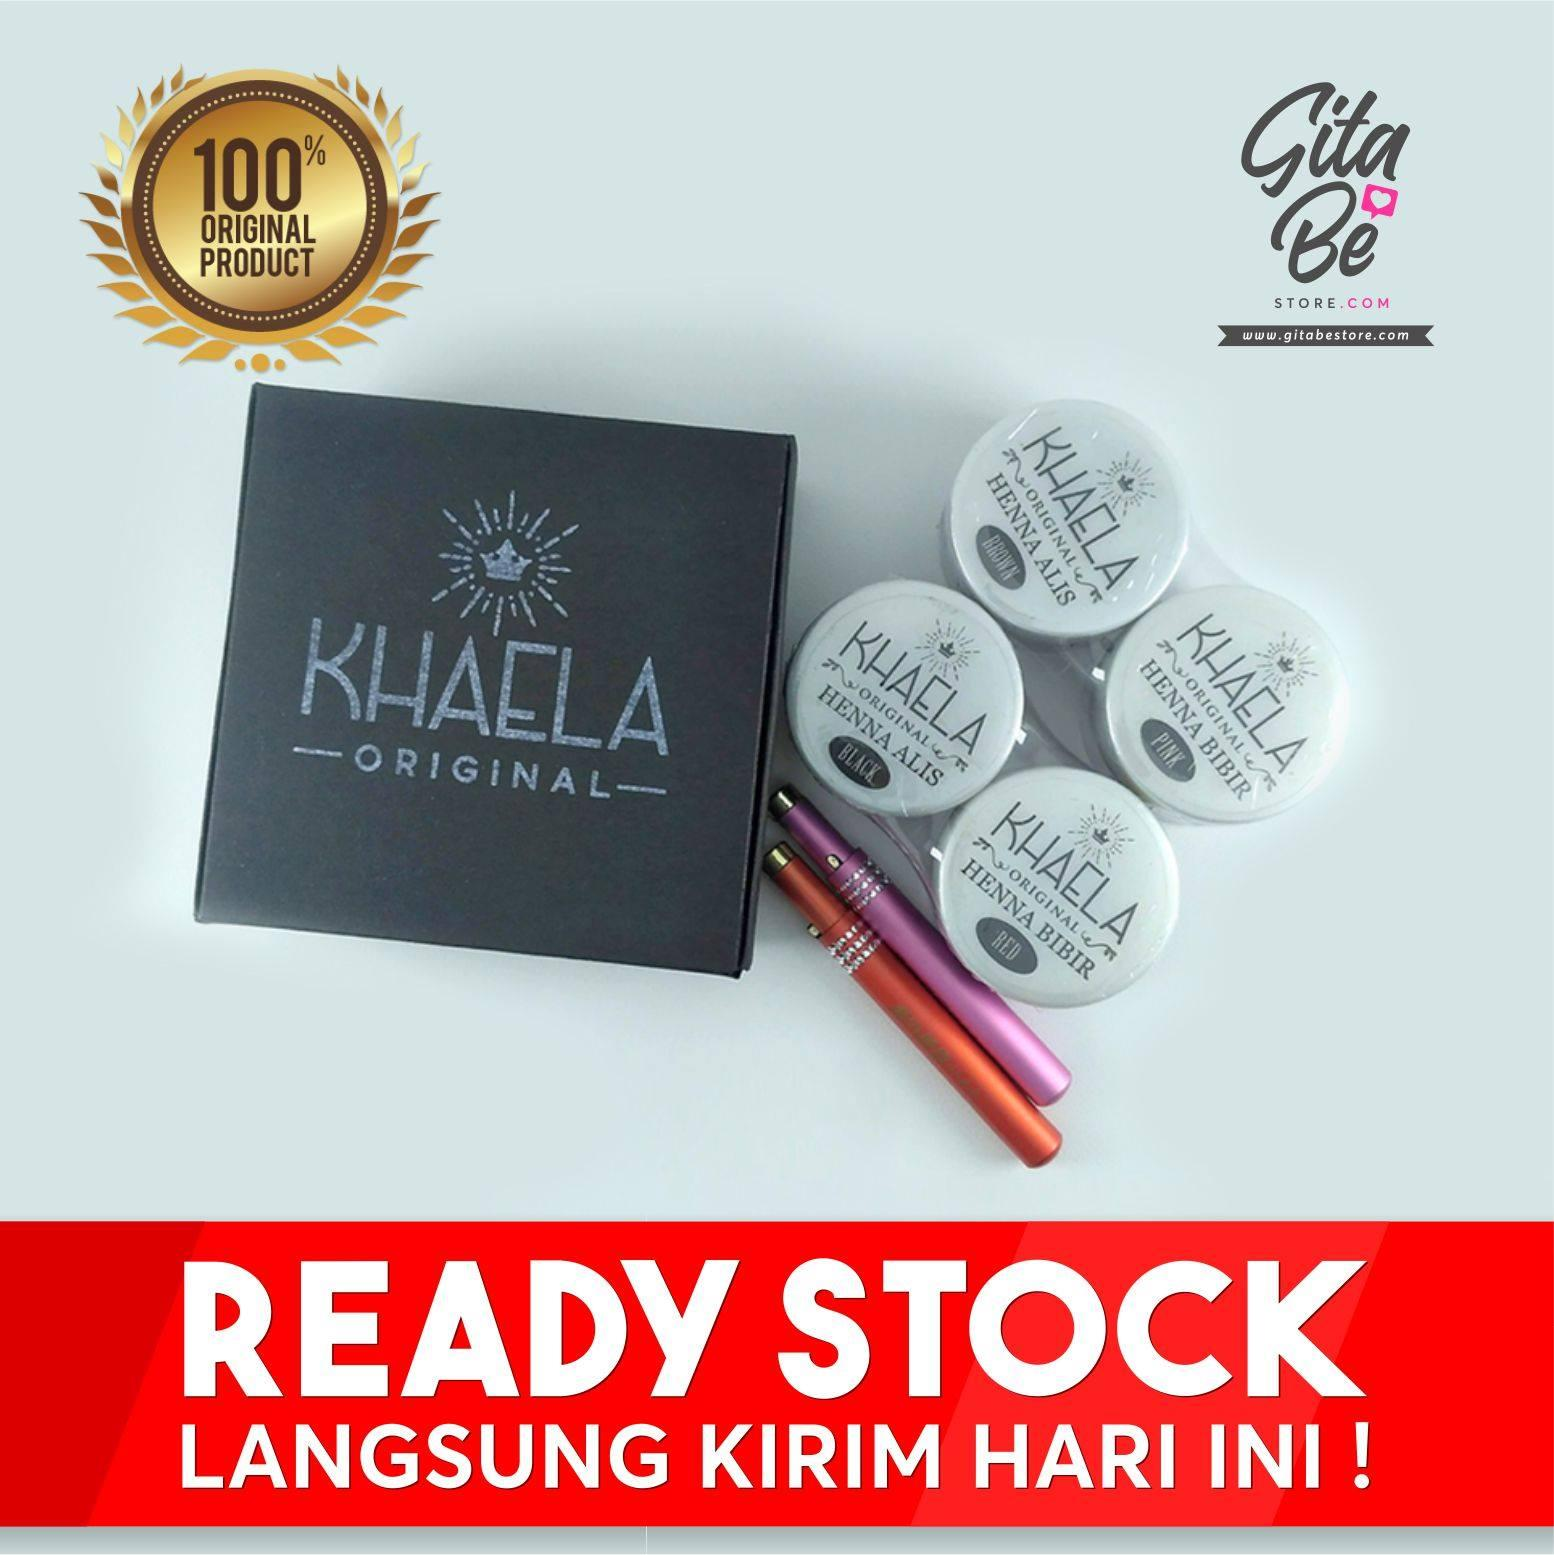 Fitur Original Paket Exclusive Khaela Henna Alis Dan Warna Coklat Hitam Ecer 1pc Bibir 2